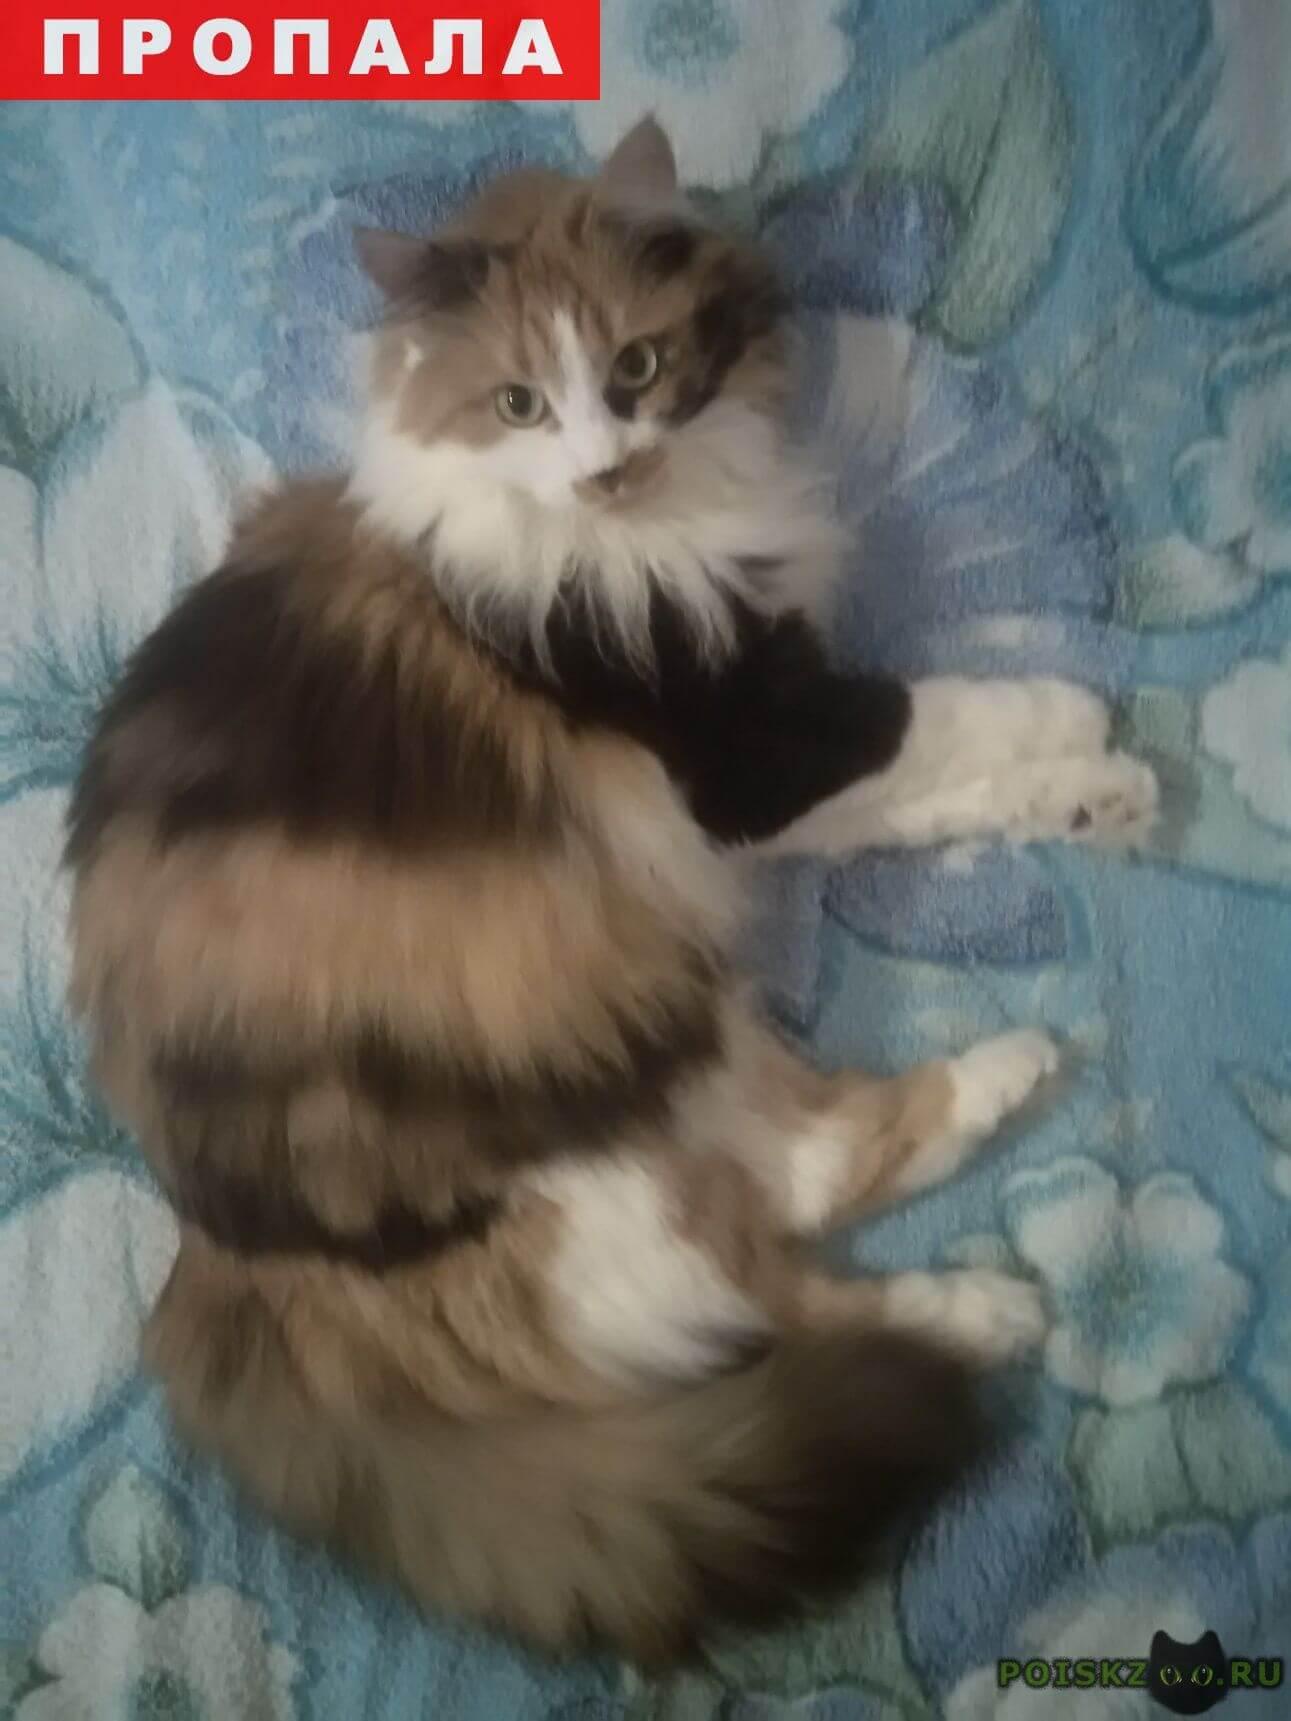 Пропала кошка г.Евпатория